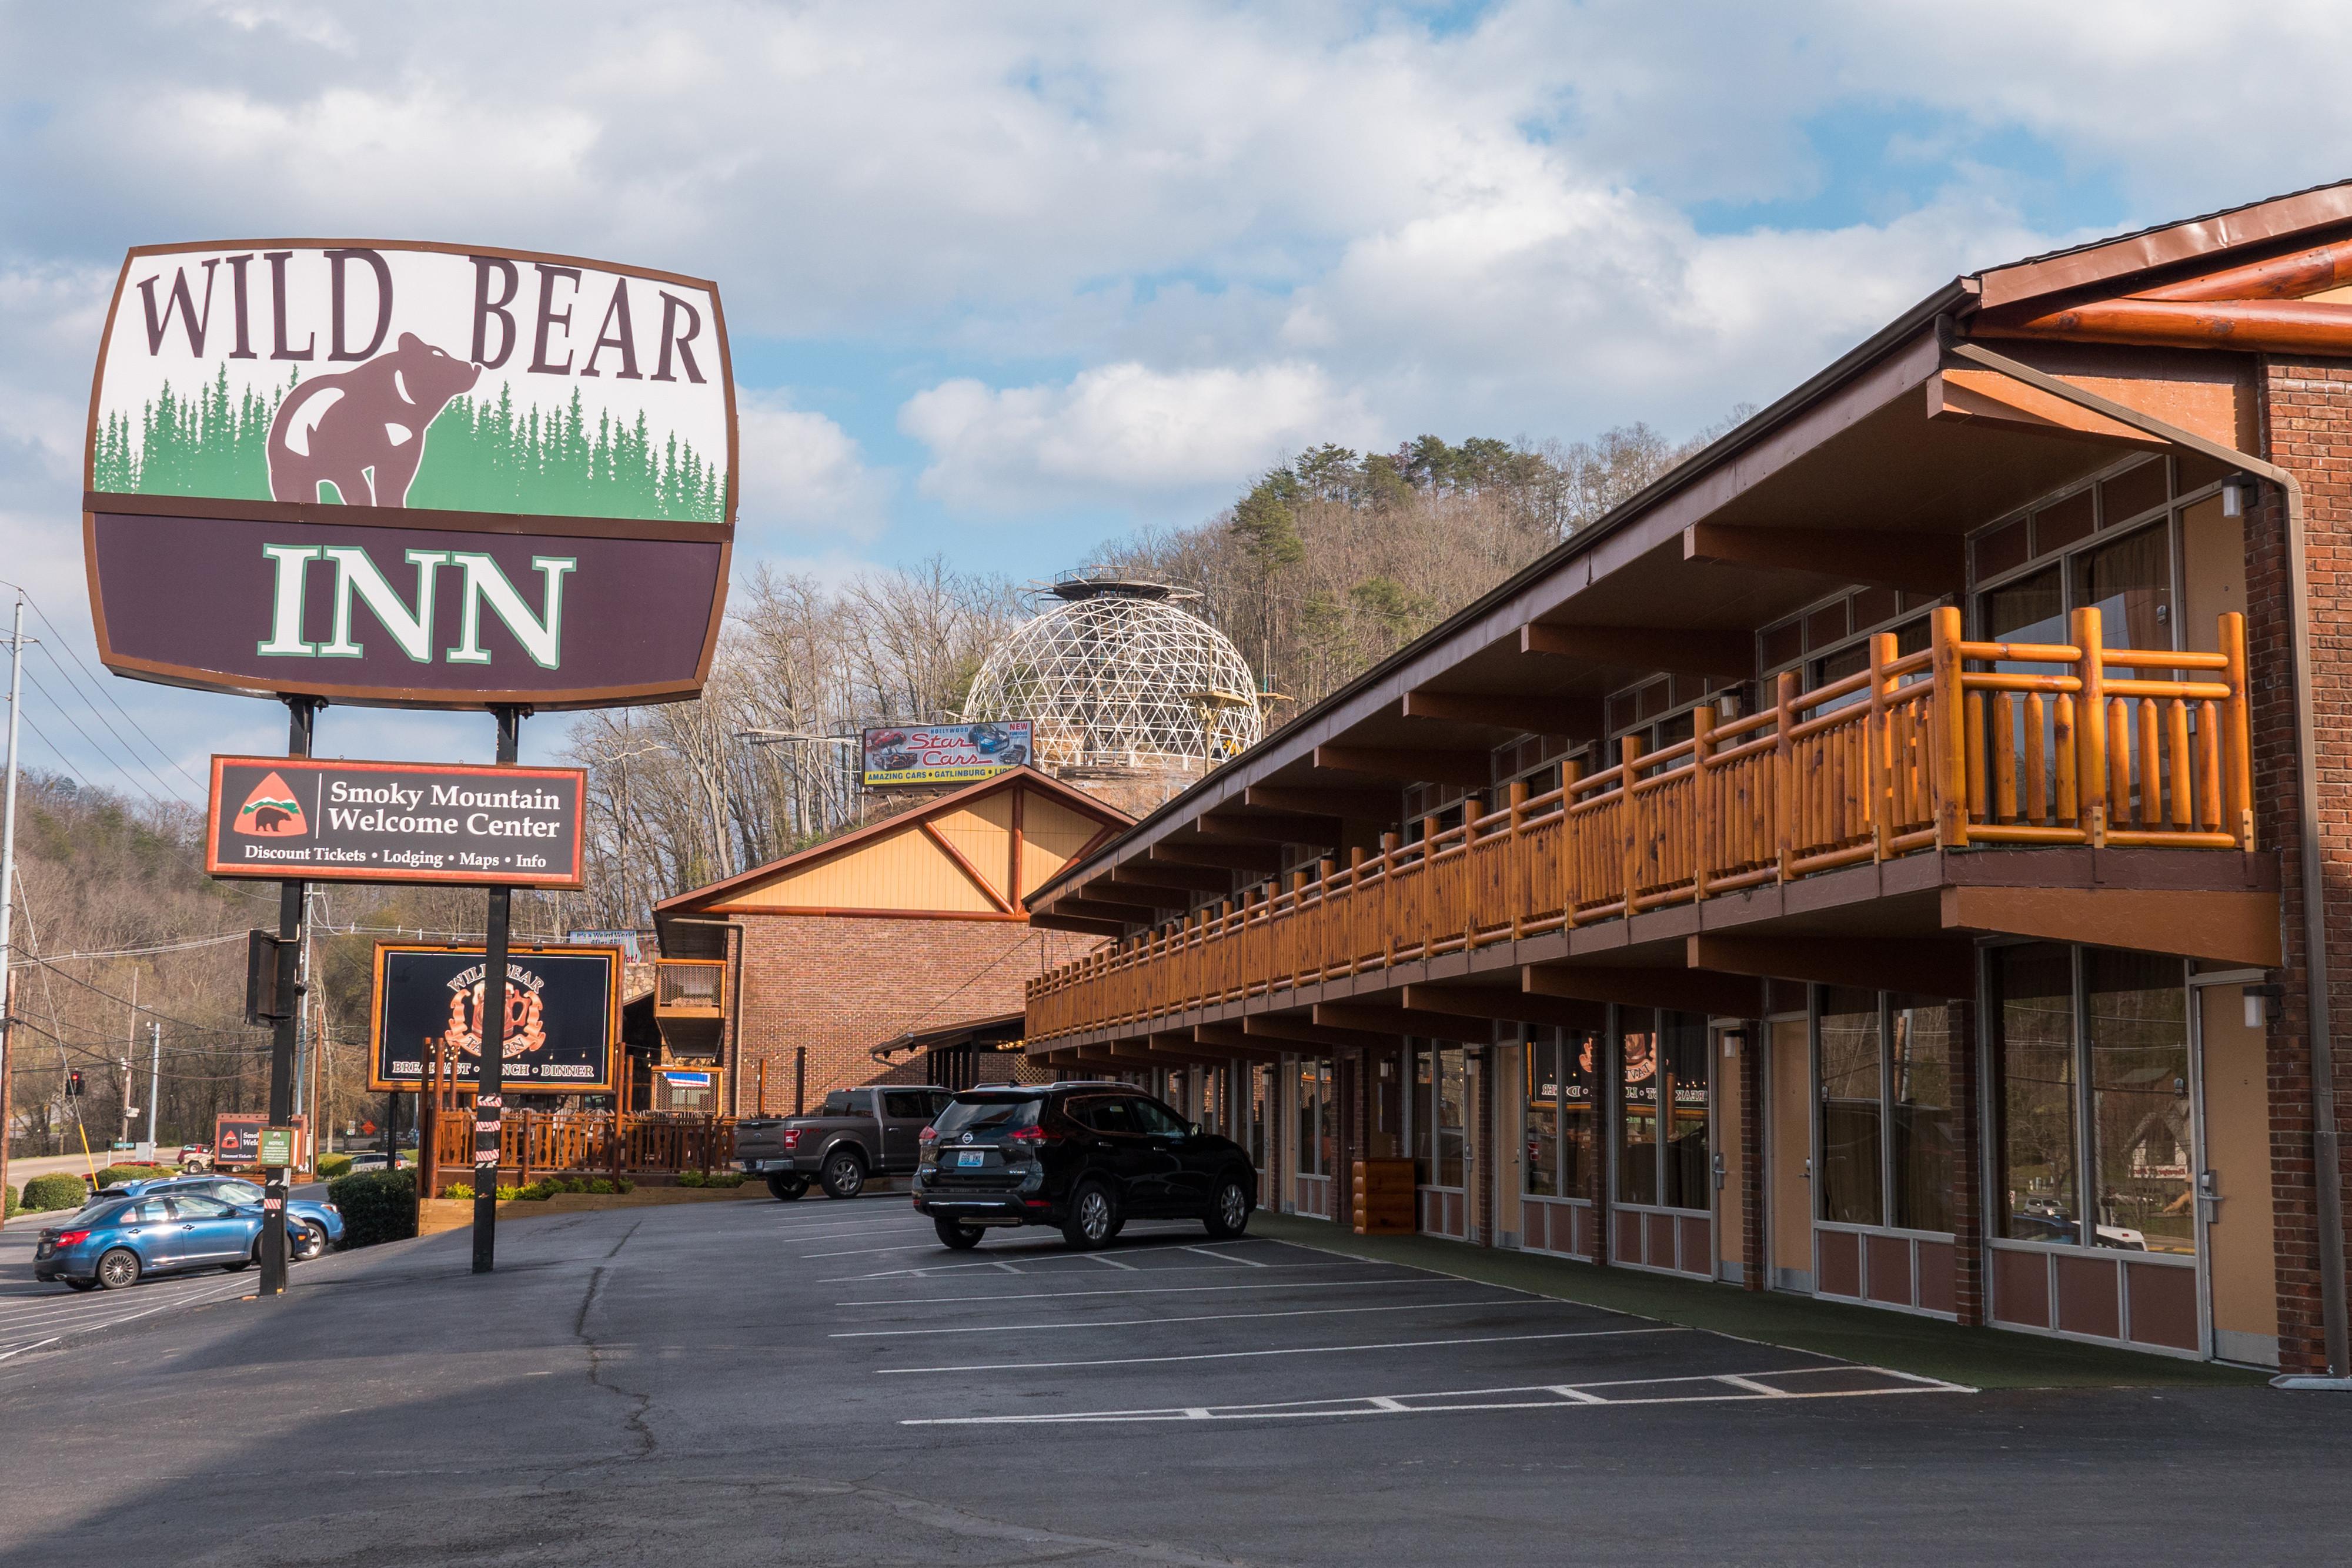 Pigeon Forge Hotel Deals - Wild Bear Inn